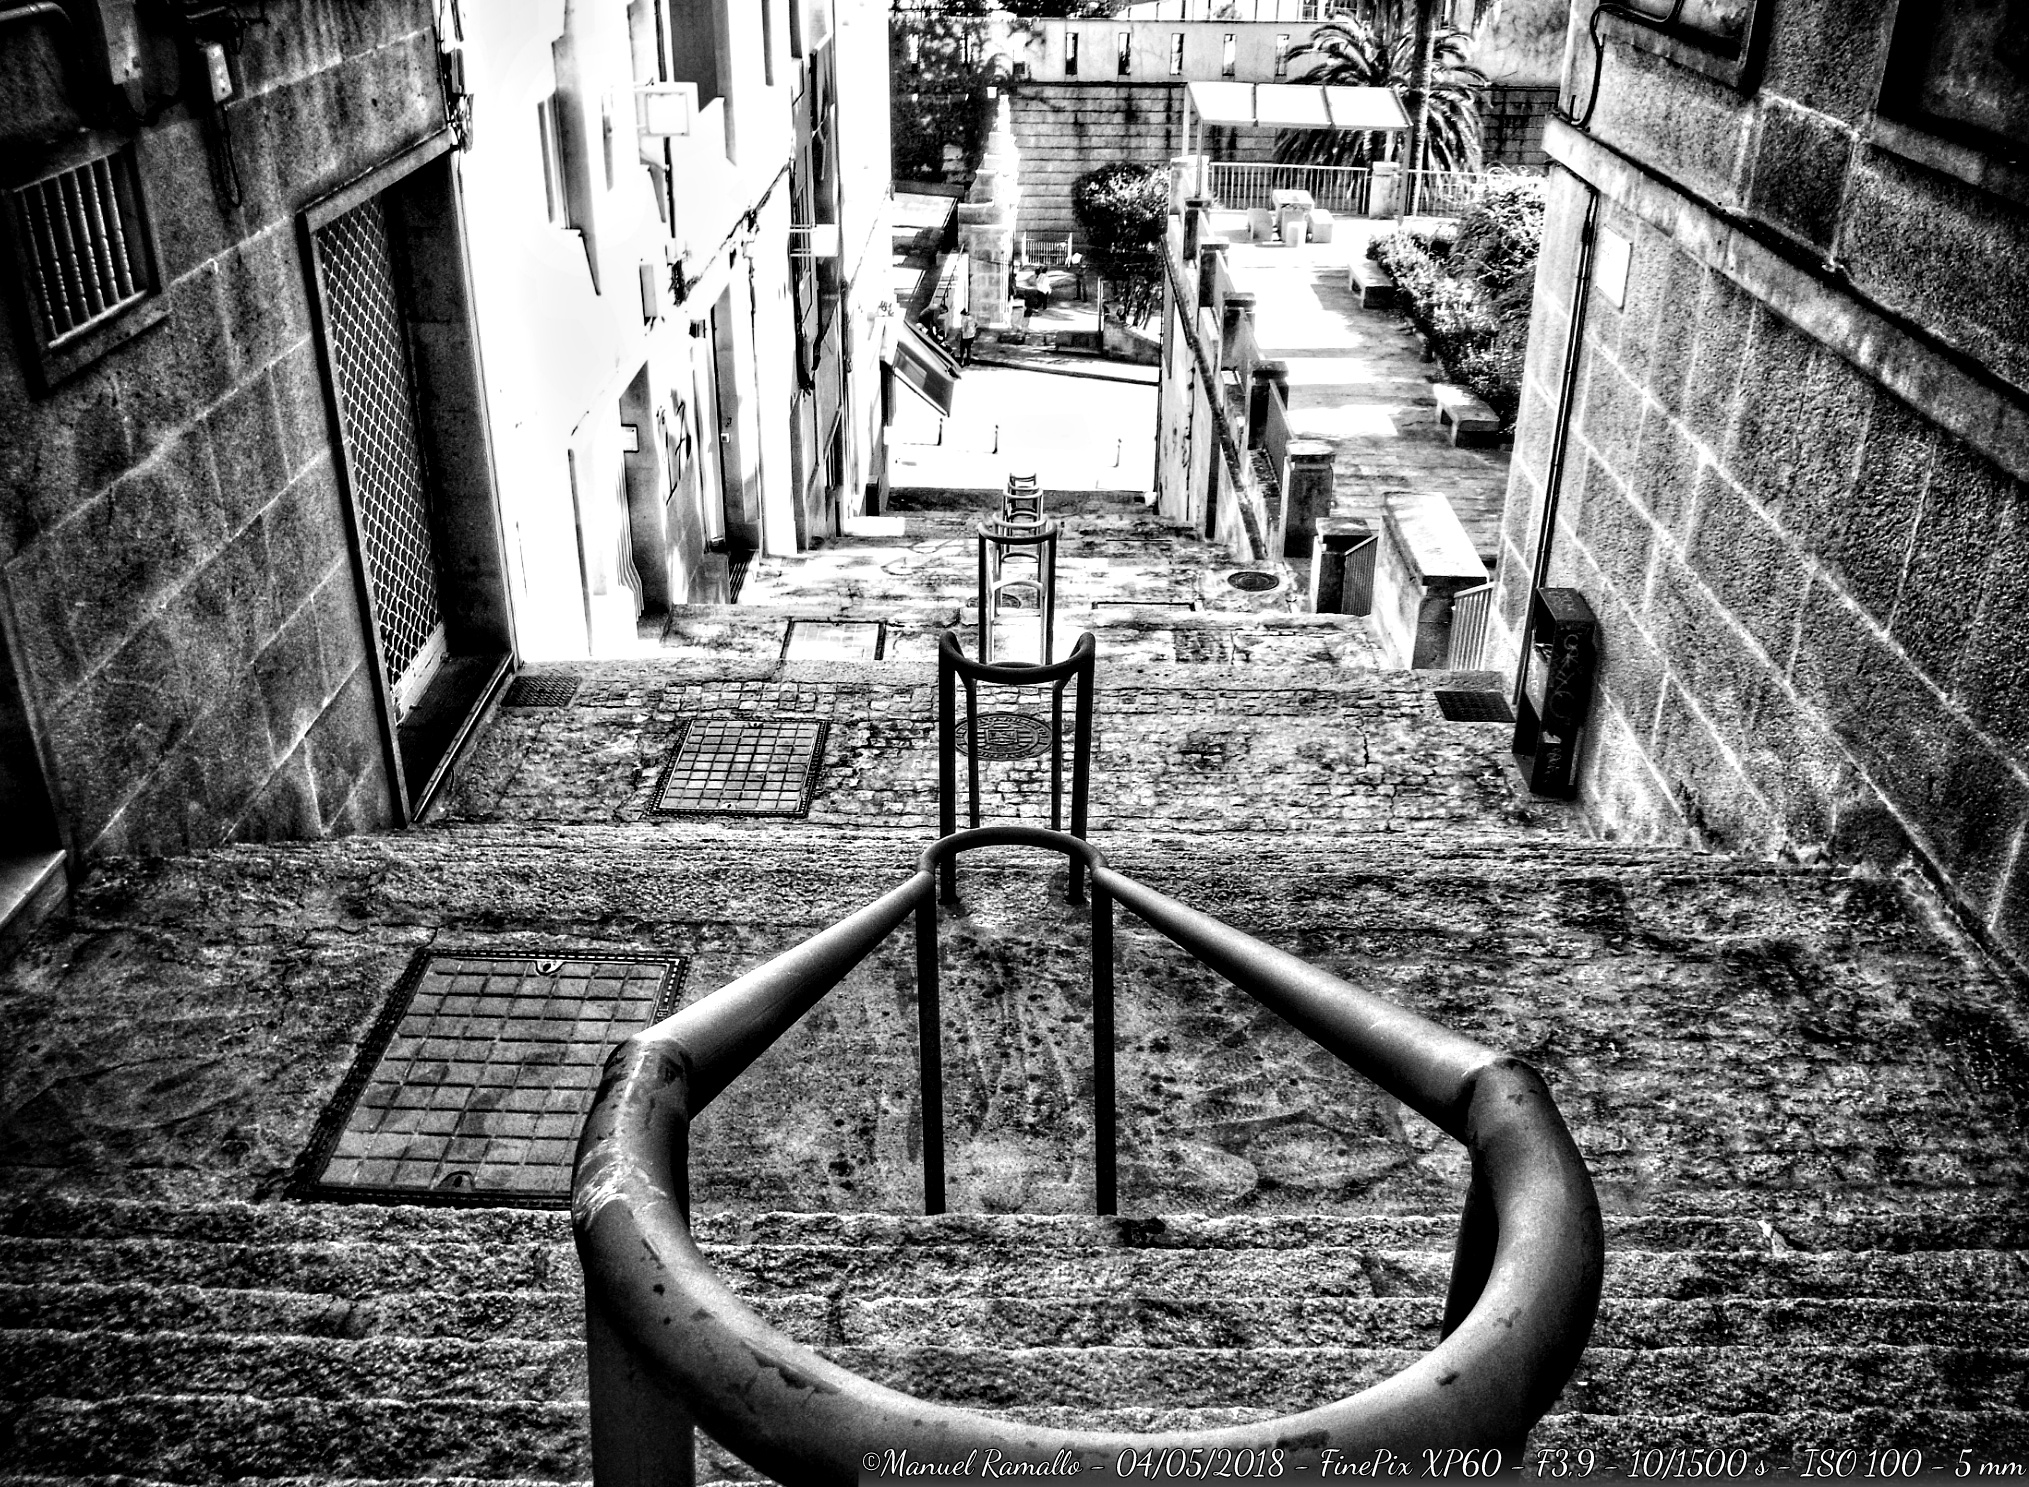 callejuela-ourense-escaleras-as-burgas-blanco-y-negro-bw